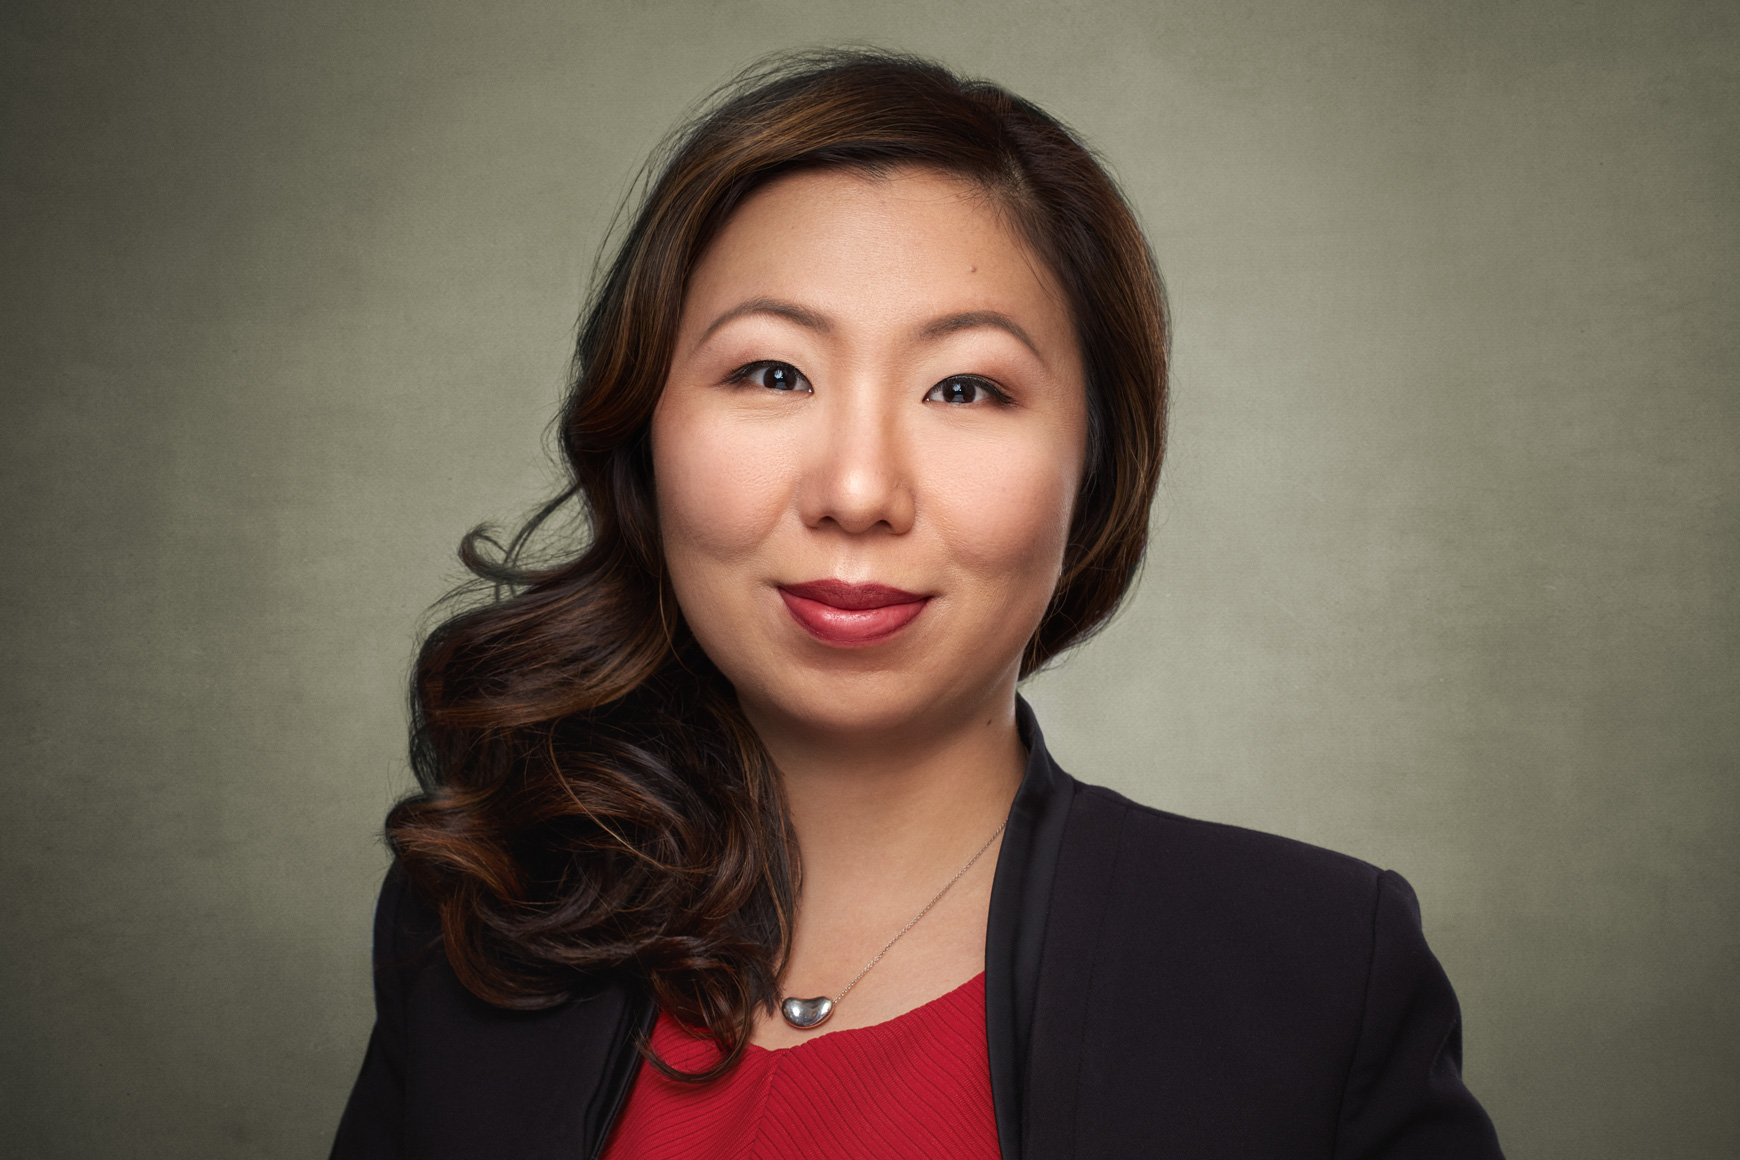 Asian American Woman Professional Headshot